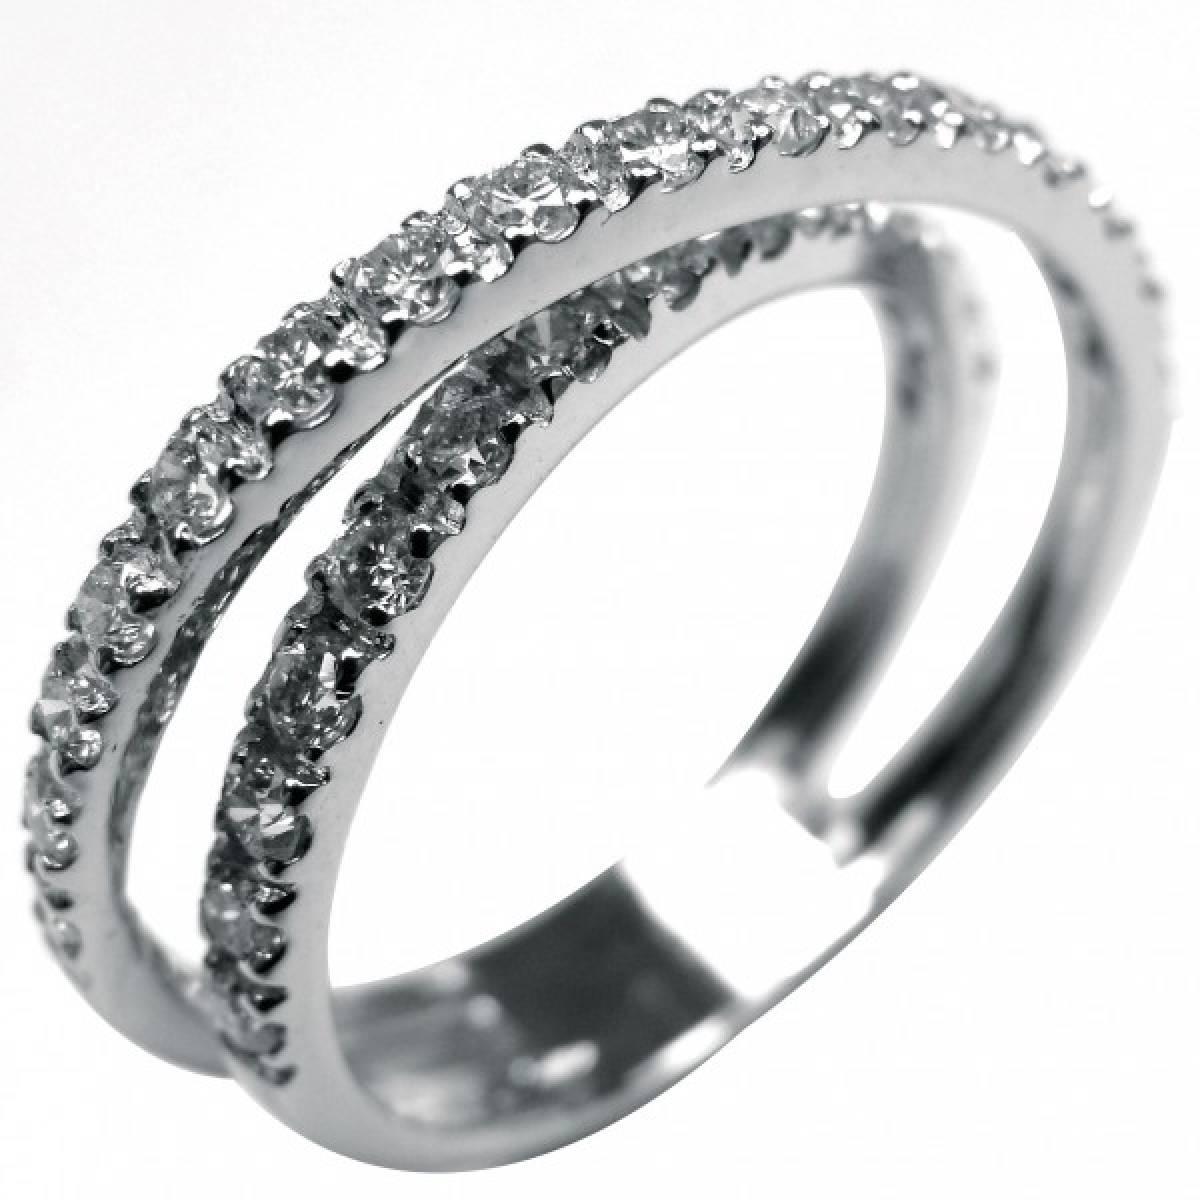 Anel de Noivado ouro branco de 19 kts, com 30 diamantes de 0,50 cts